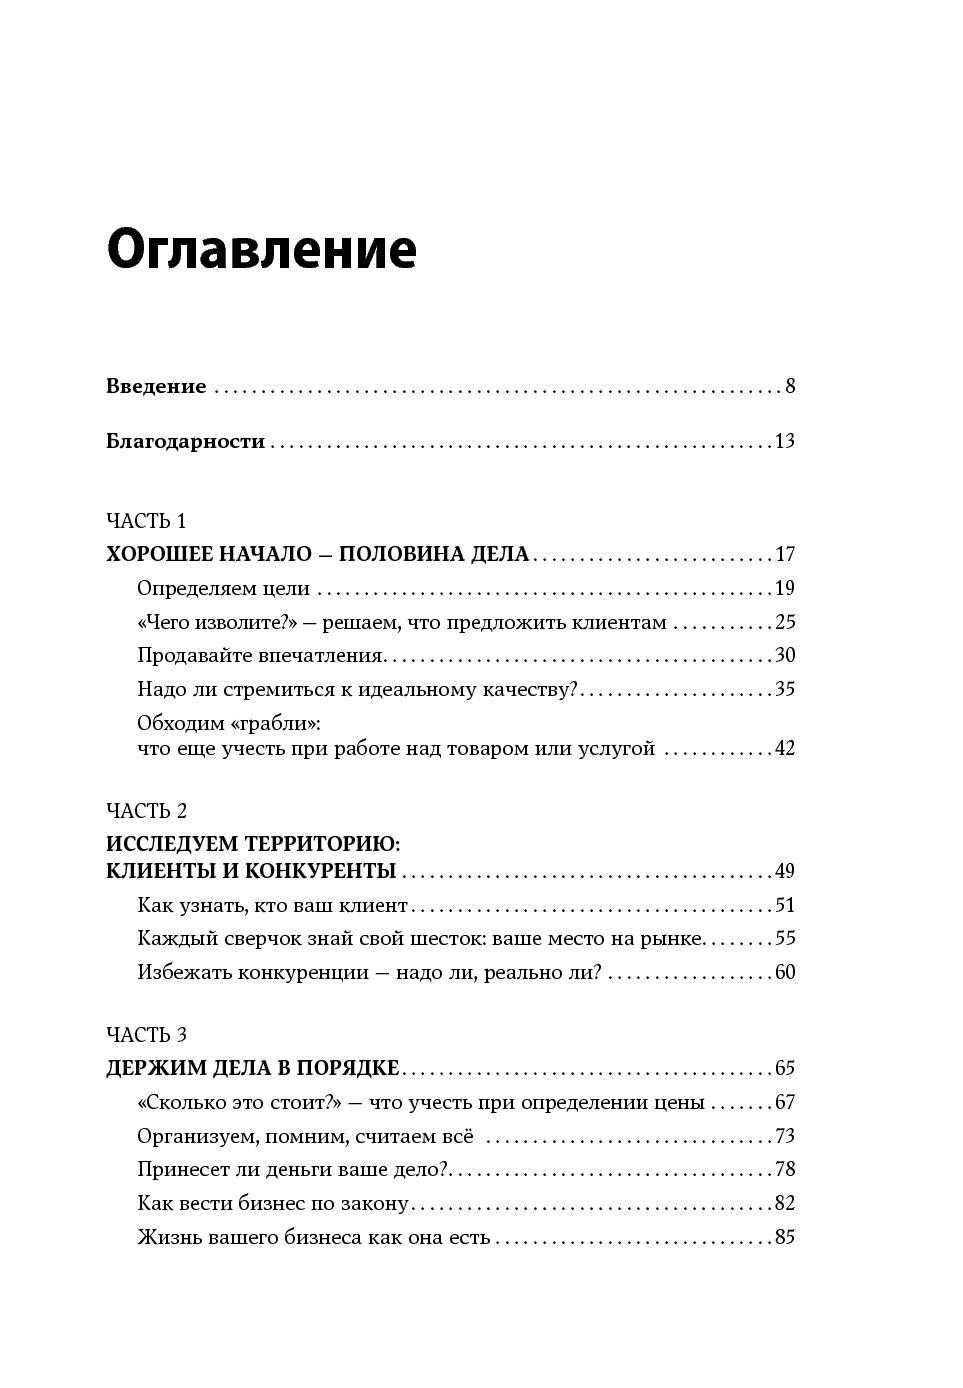 Книга бизнес своими руками 882